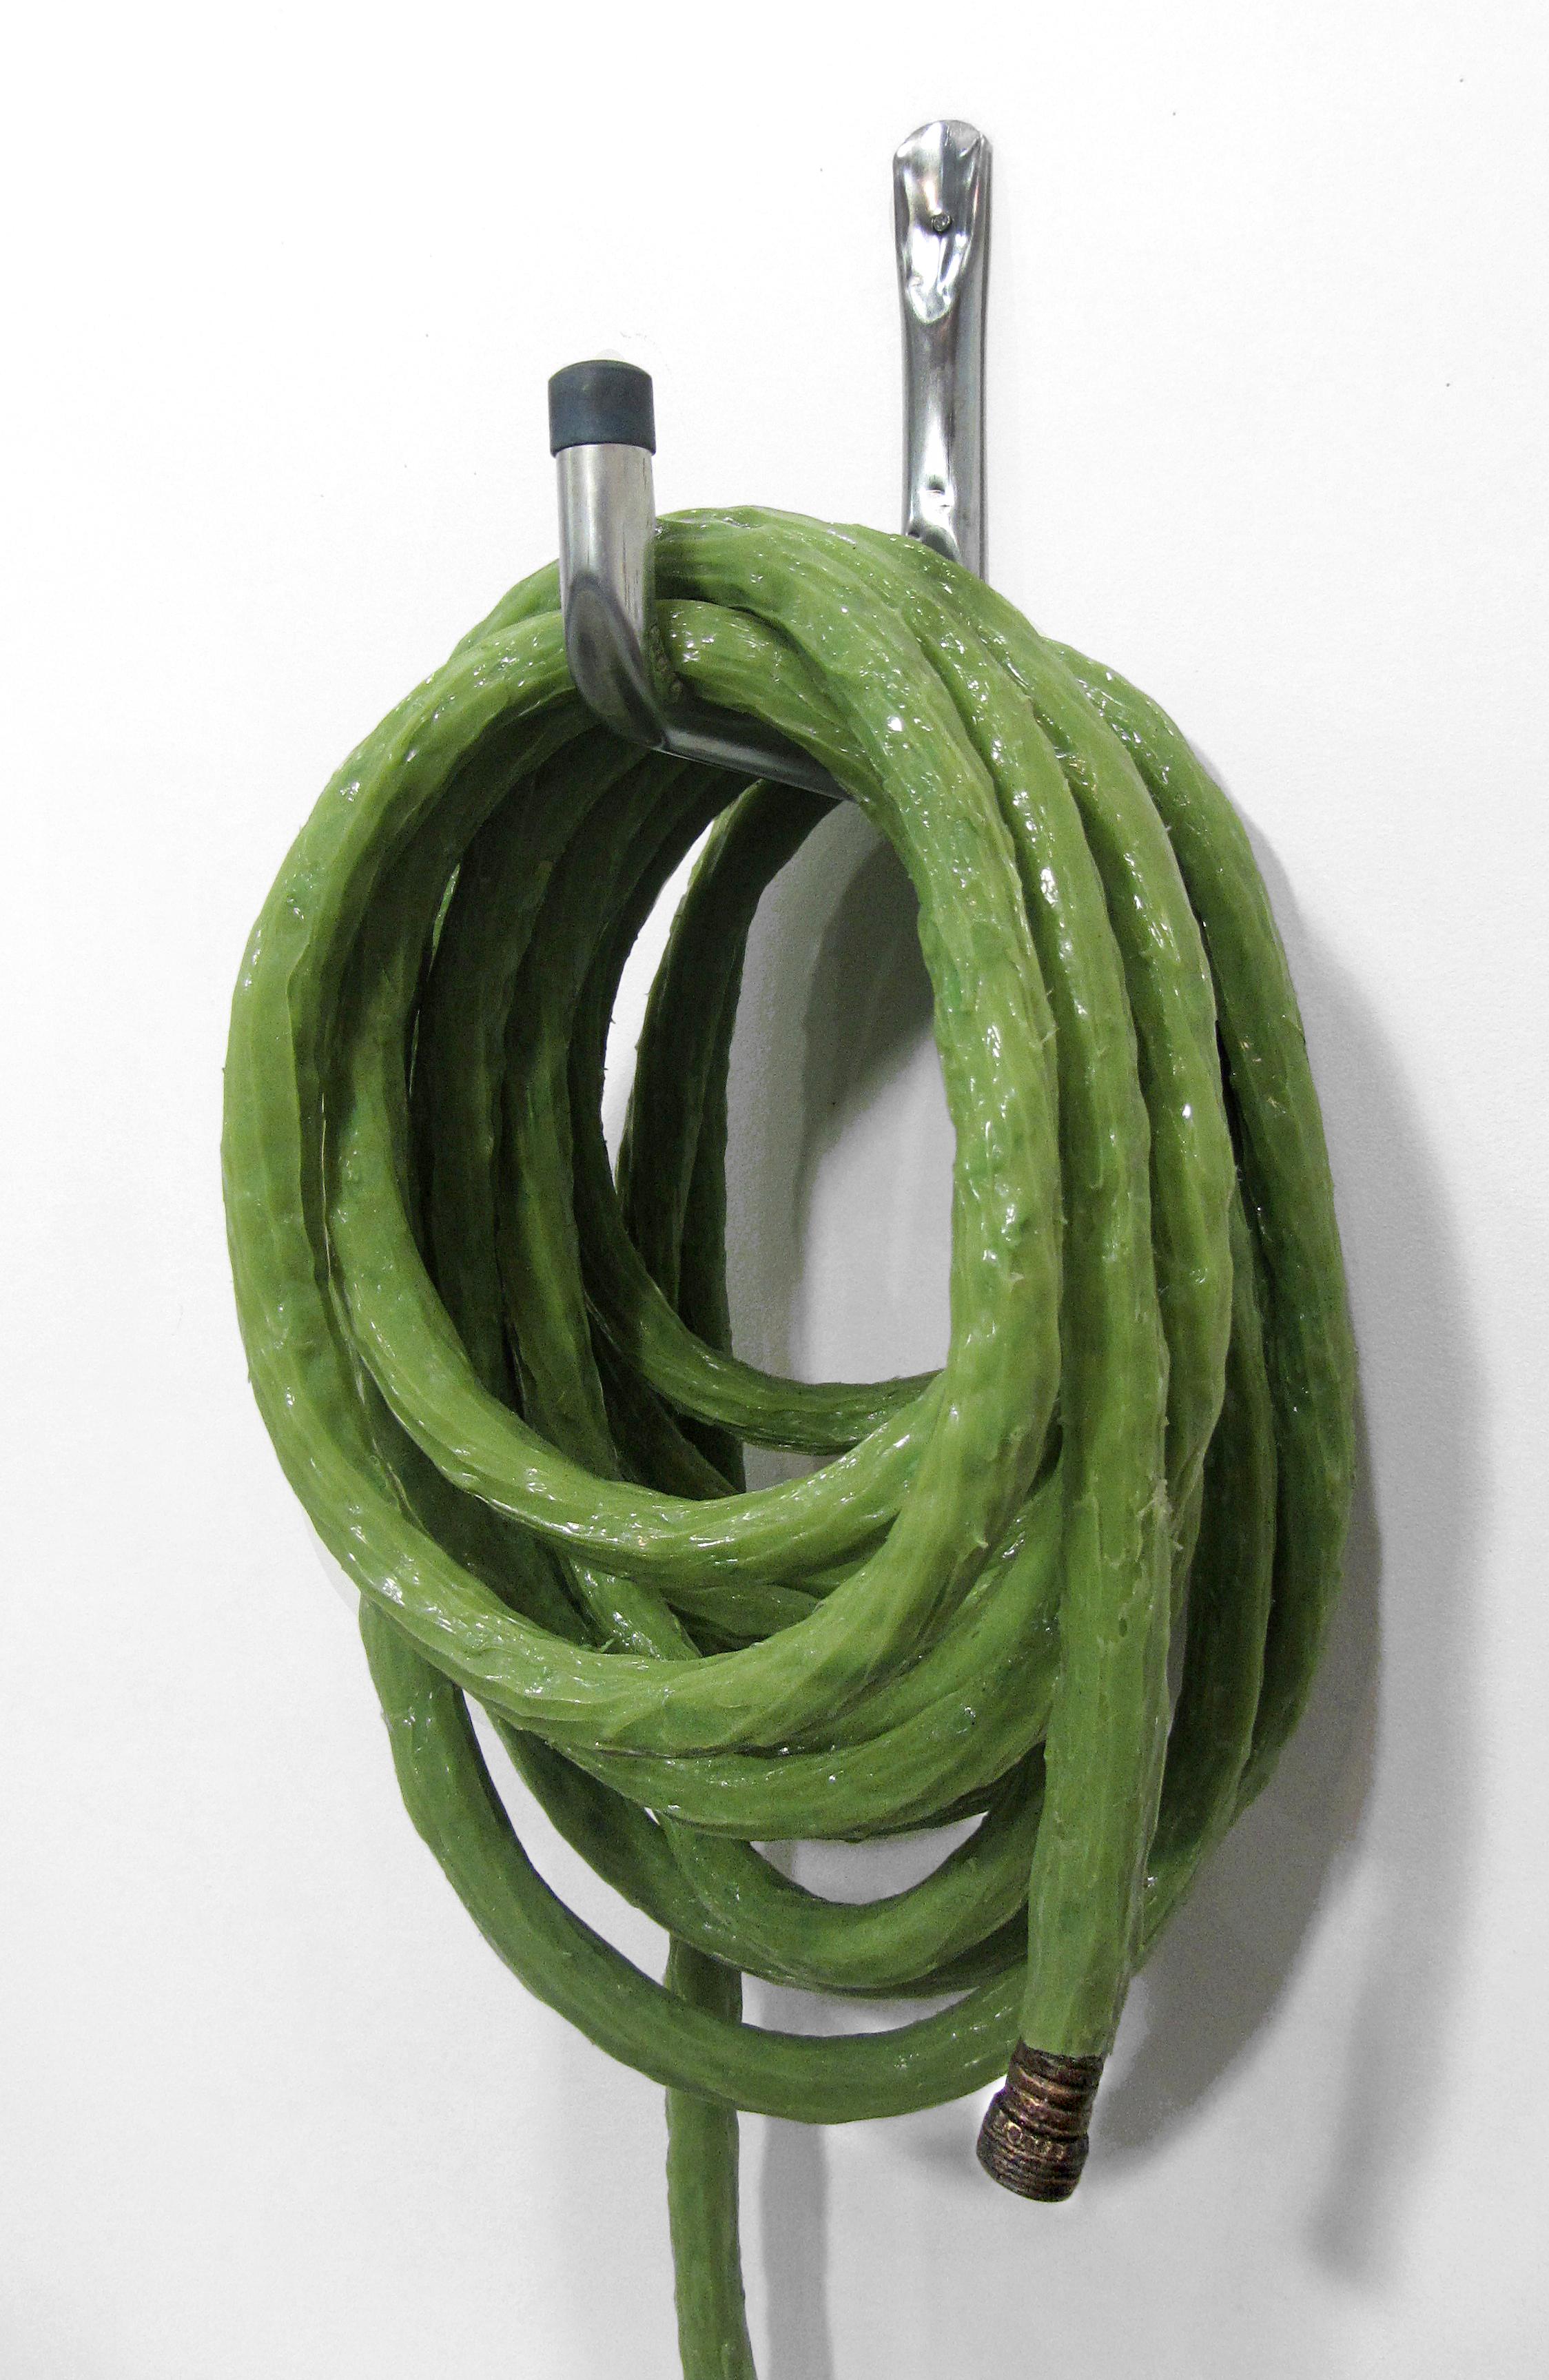 Water hose, Bright Green.jpg